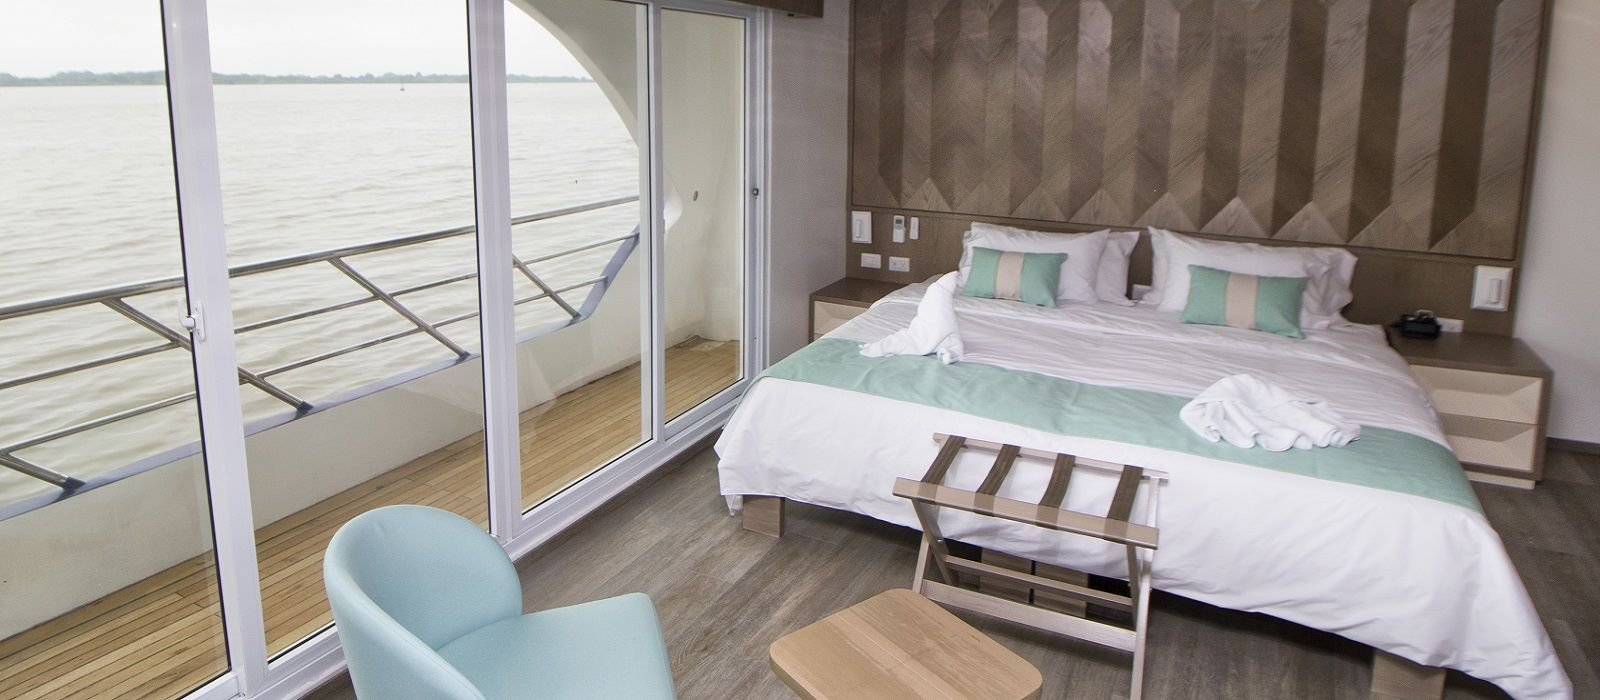 Hotel Galapagos Endemic Ecuador/Galapagos